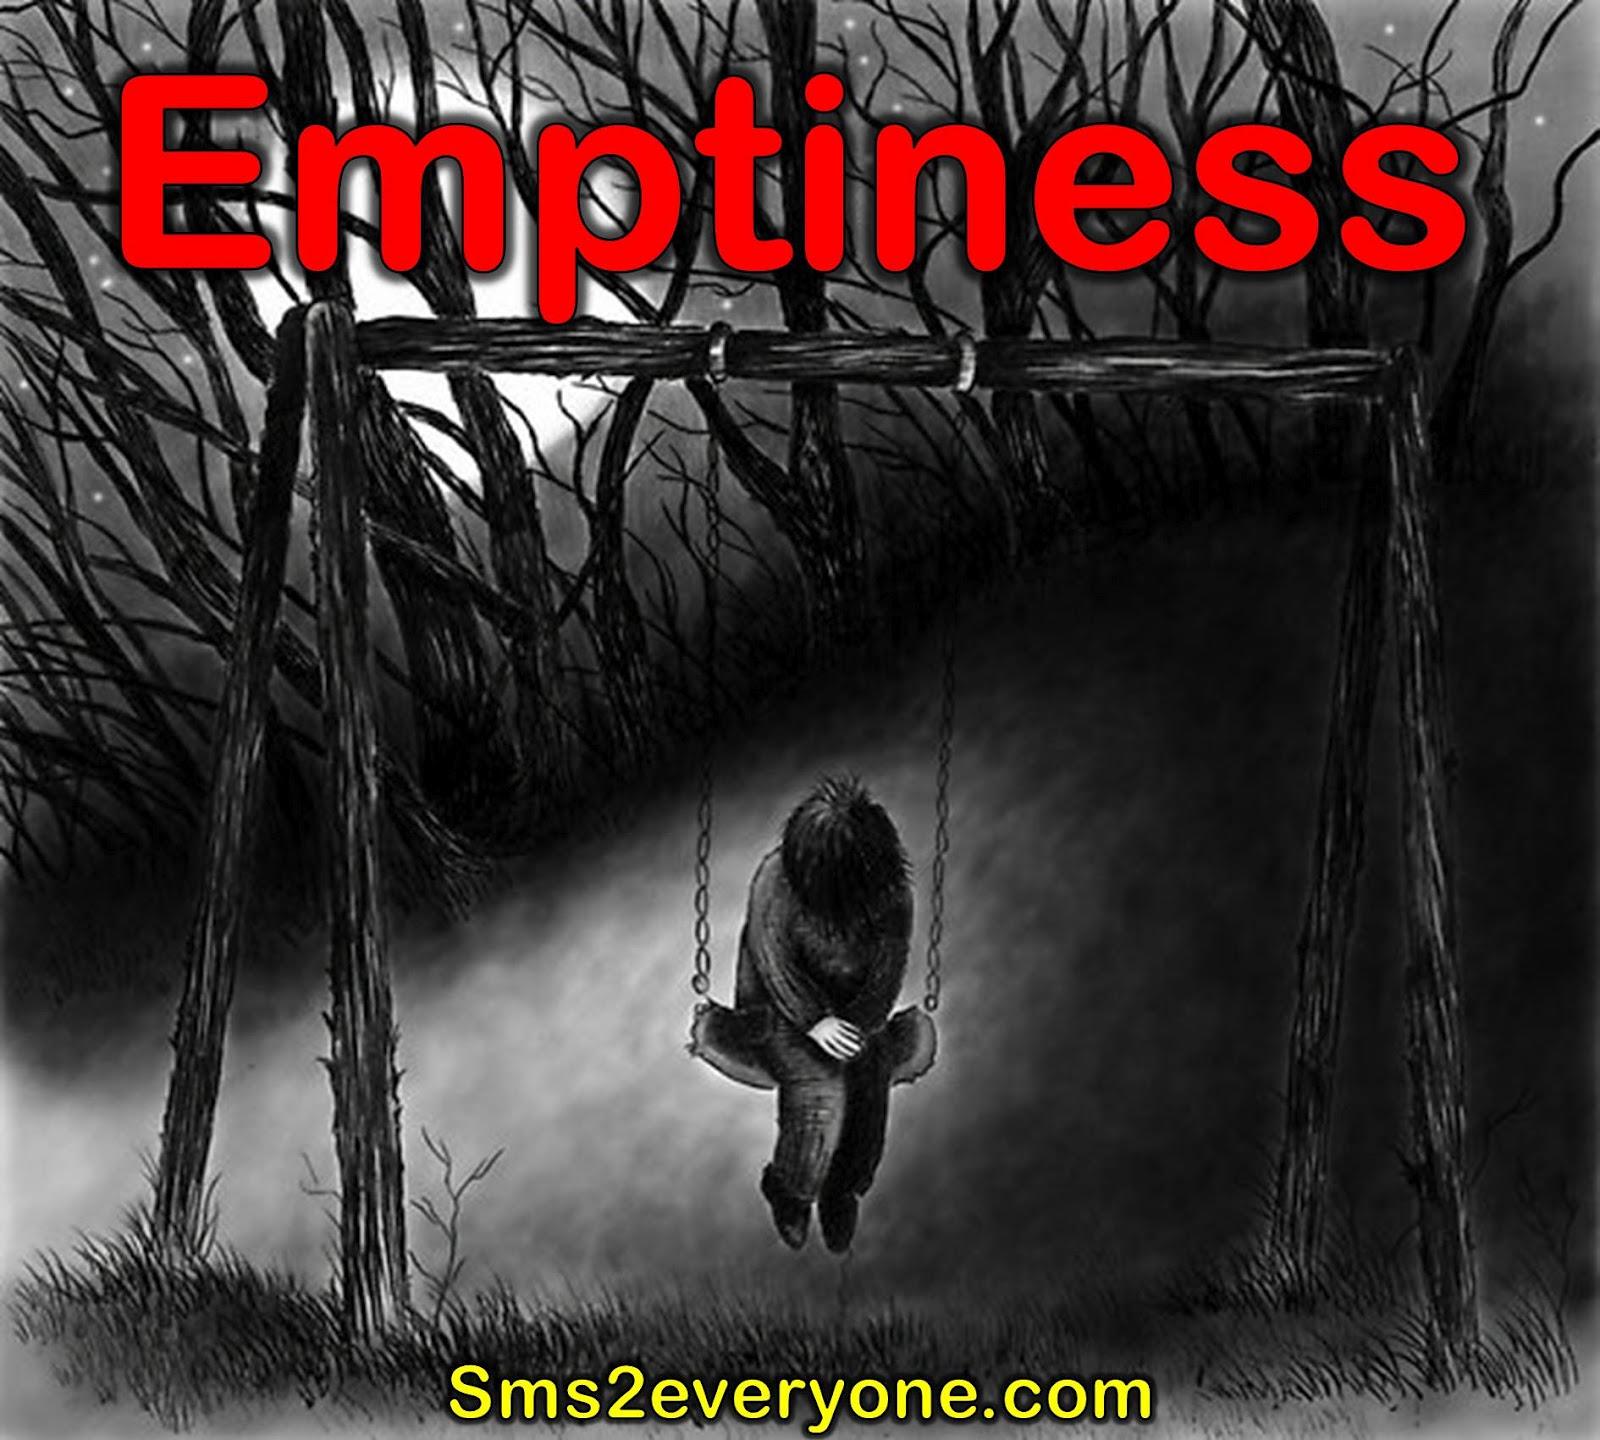 f0e50 emptiness